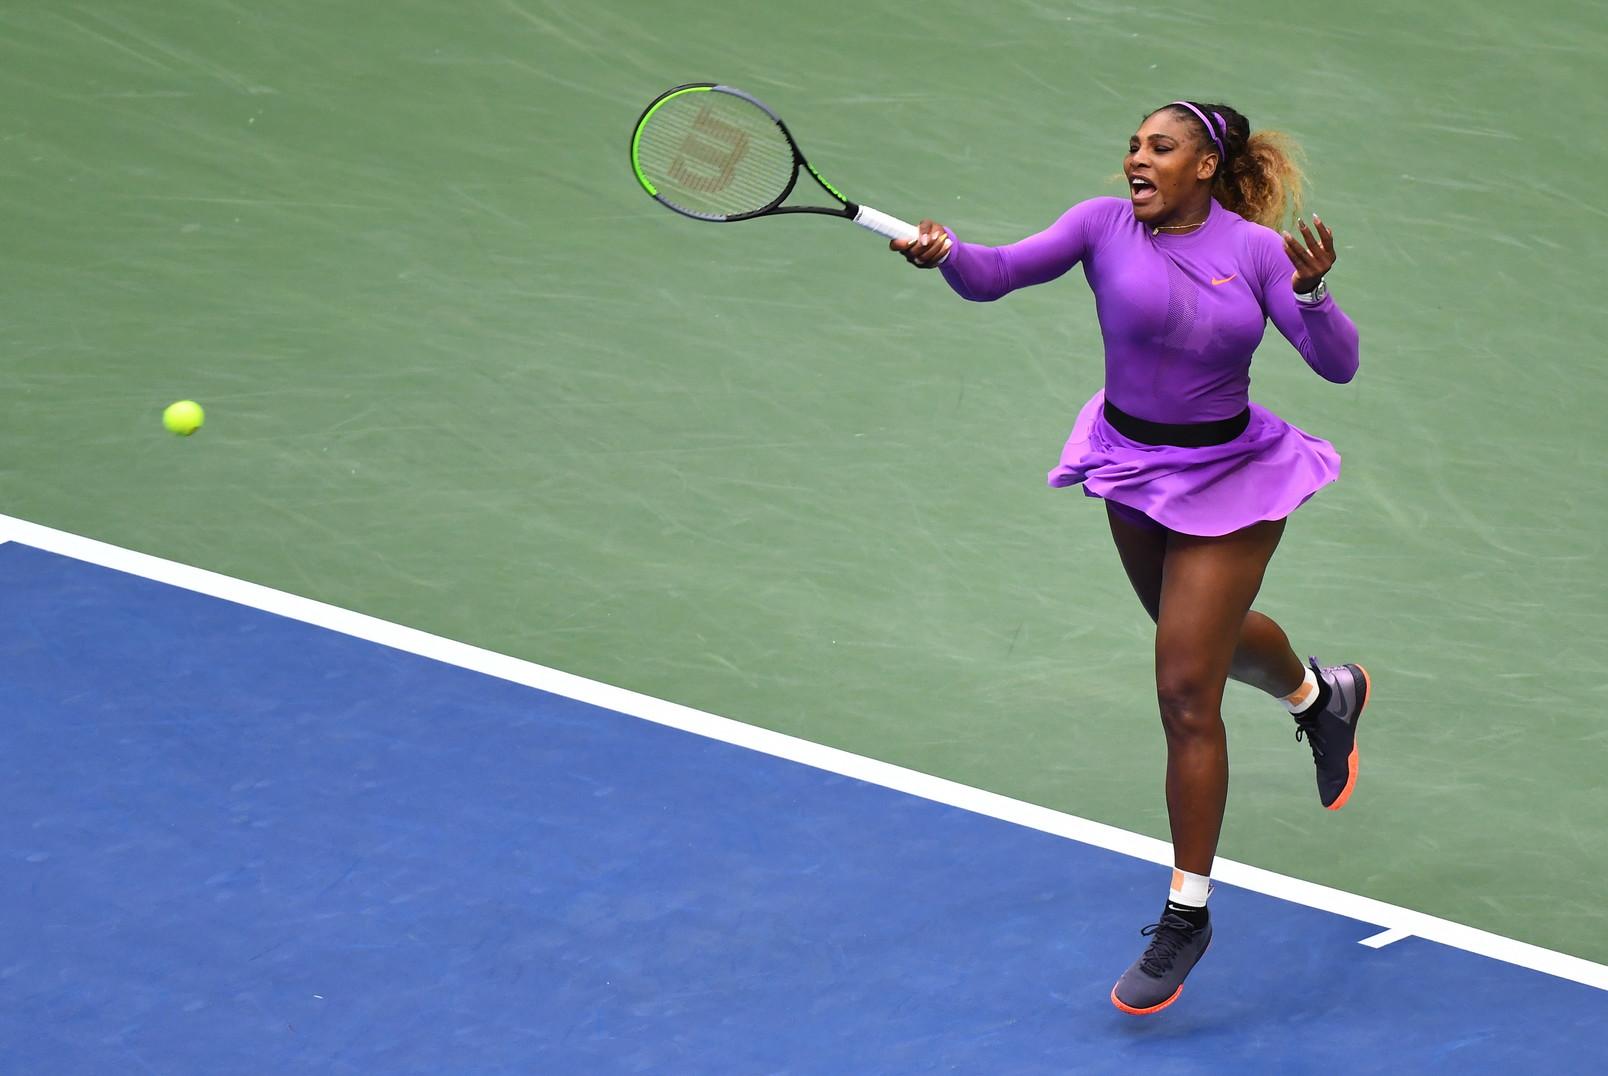 2) Serena Williams (tennis)